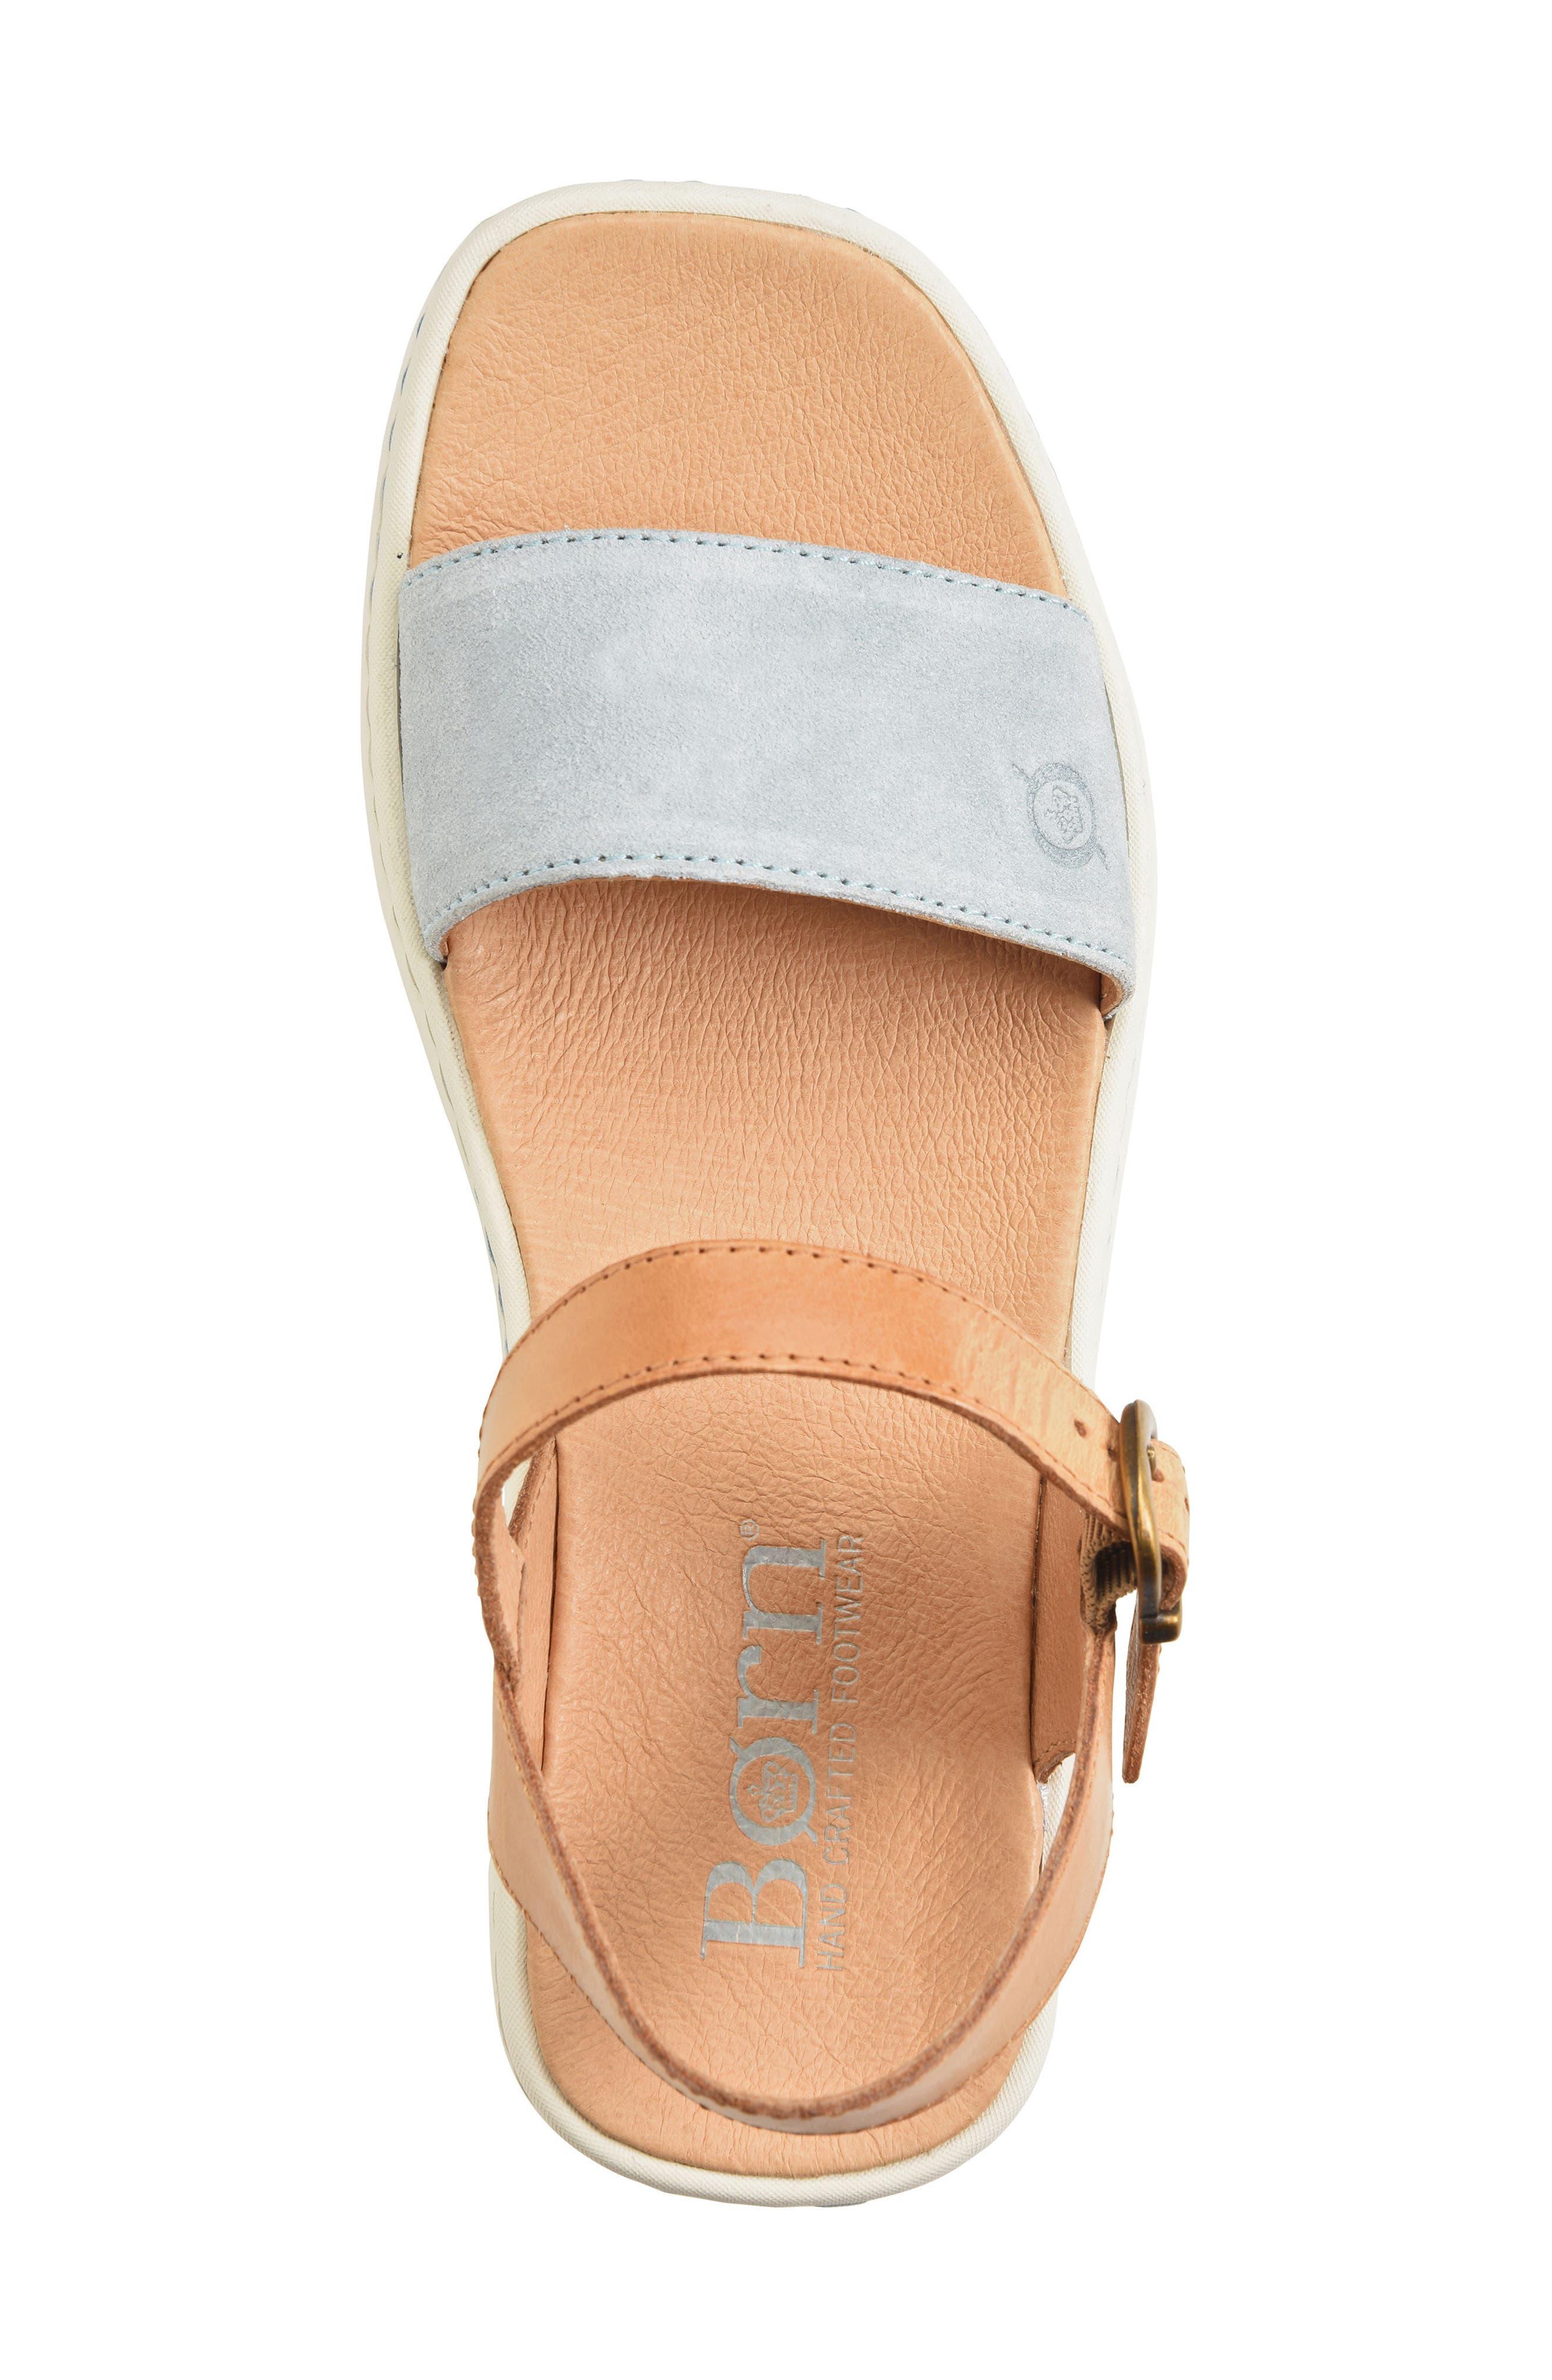 Breaker Platform Sandal,                             Alternate thumbnail 5, color,                             Light Blue/ Tan Leather